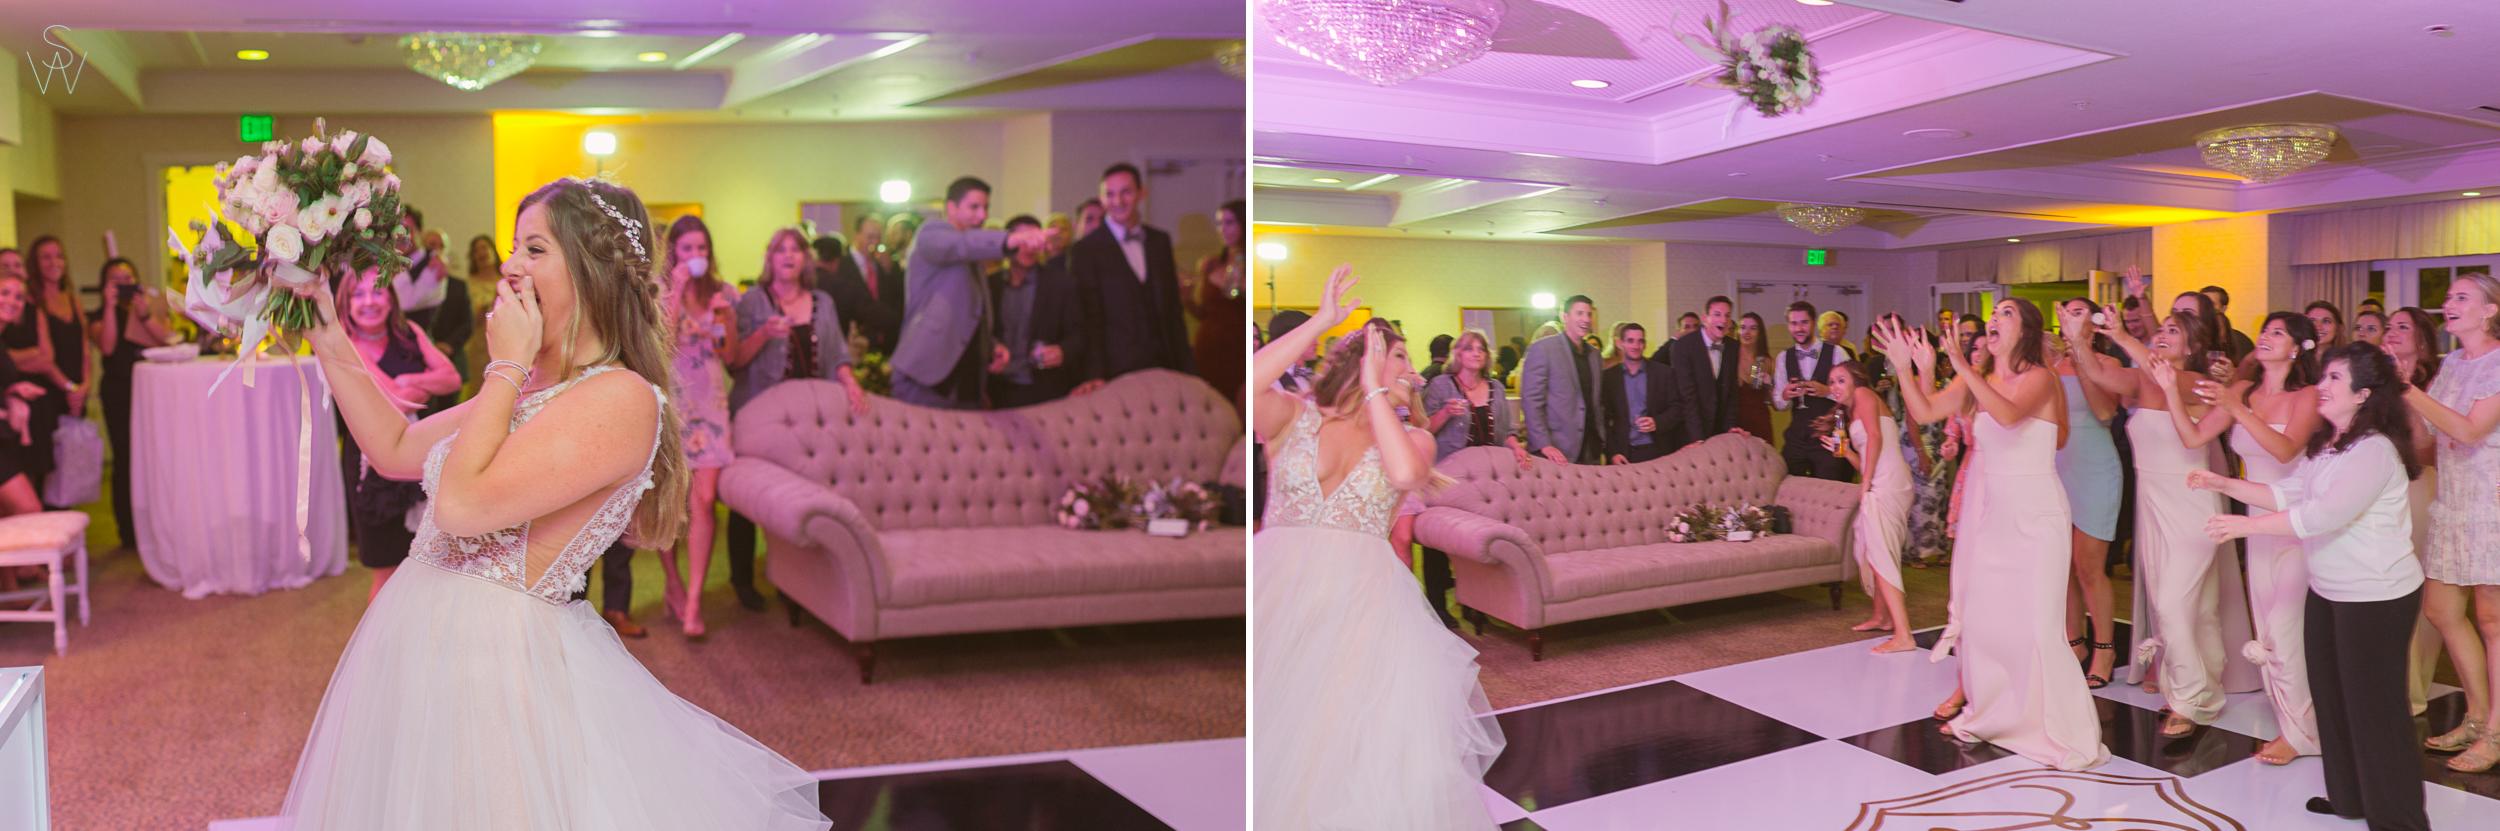 235Lauberge.shewanders.wedding.photography.JPG